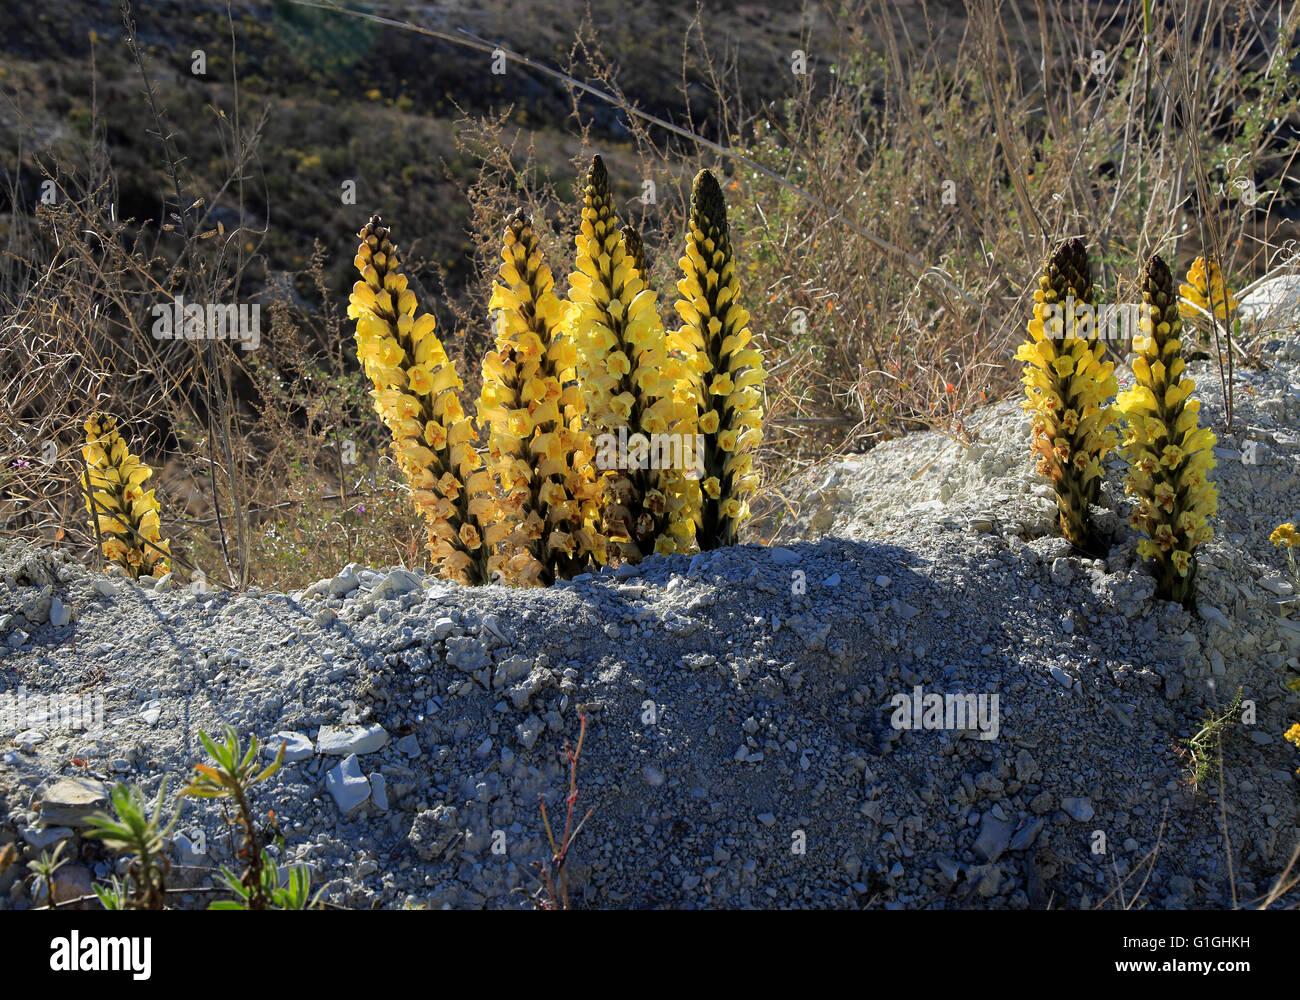 Yellow broomrape, Cistanche phelypaea, flowering in Paraje Natural de Karst en Yesos, Sorbas, Almeria, Spain Stock Photo